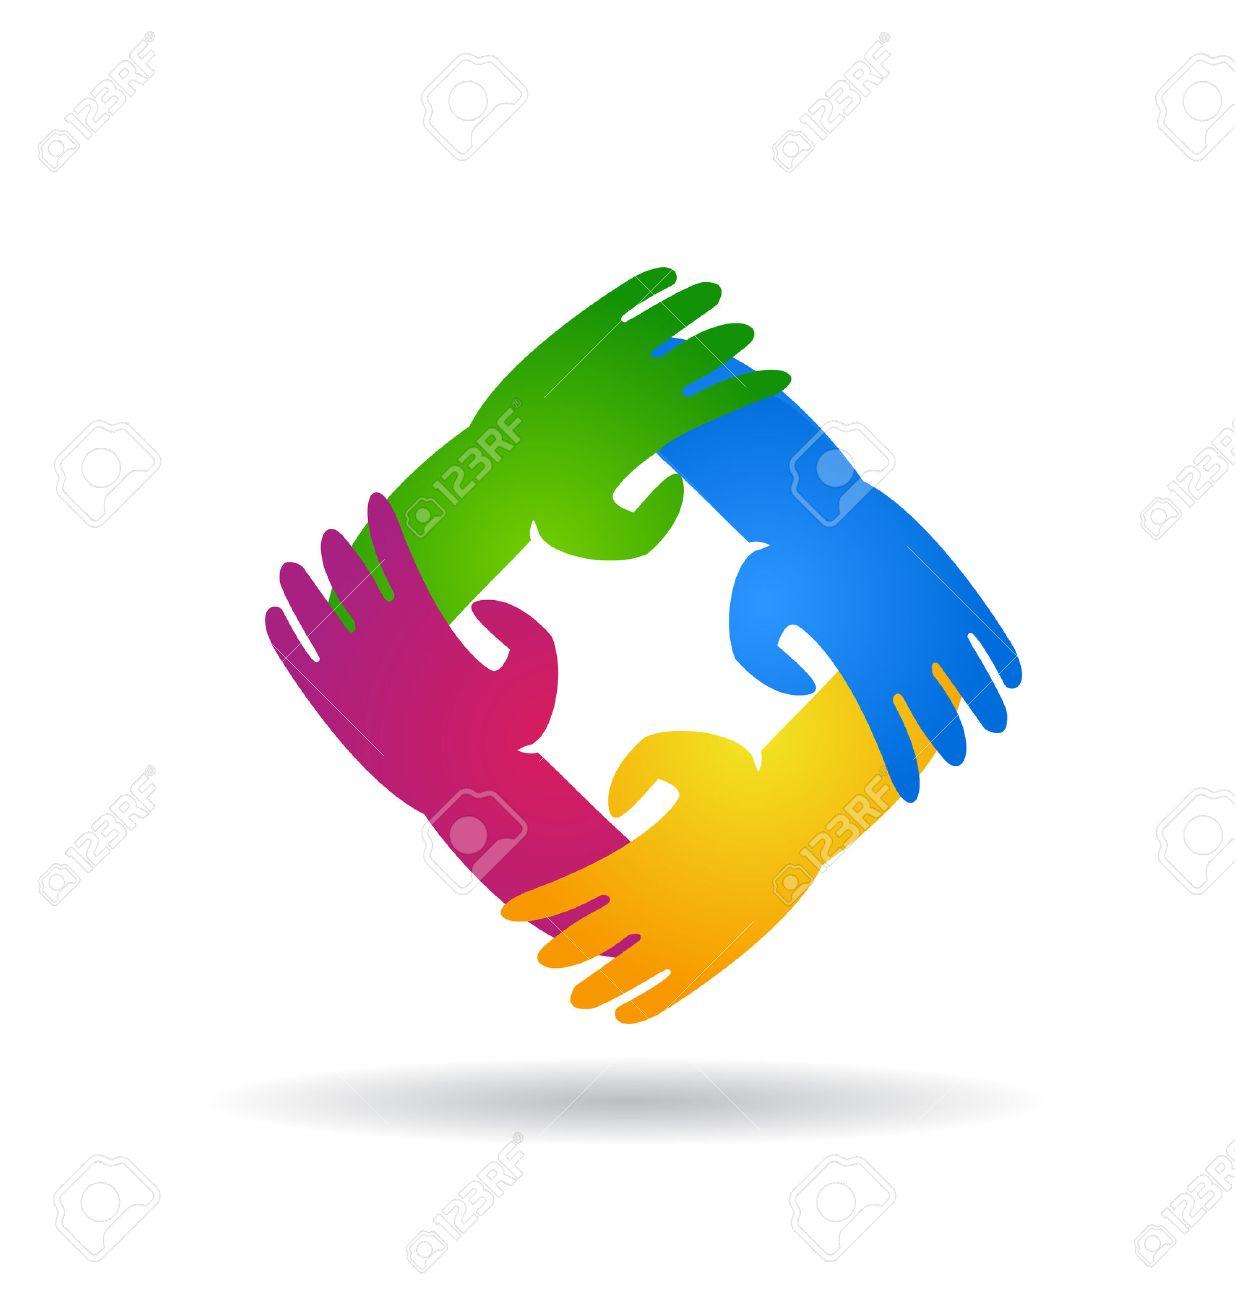 Teamwork four hands around colorful vector icon design logo - 39943009